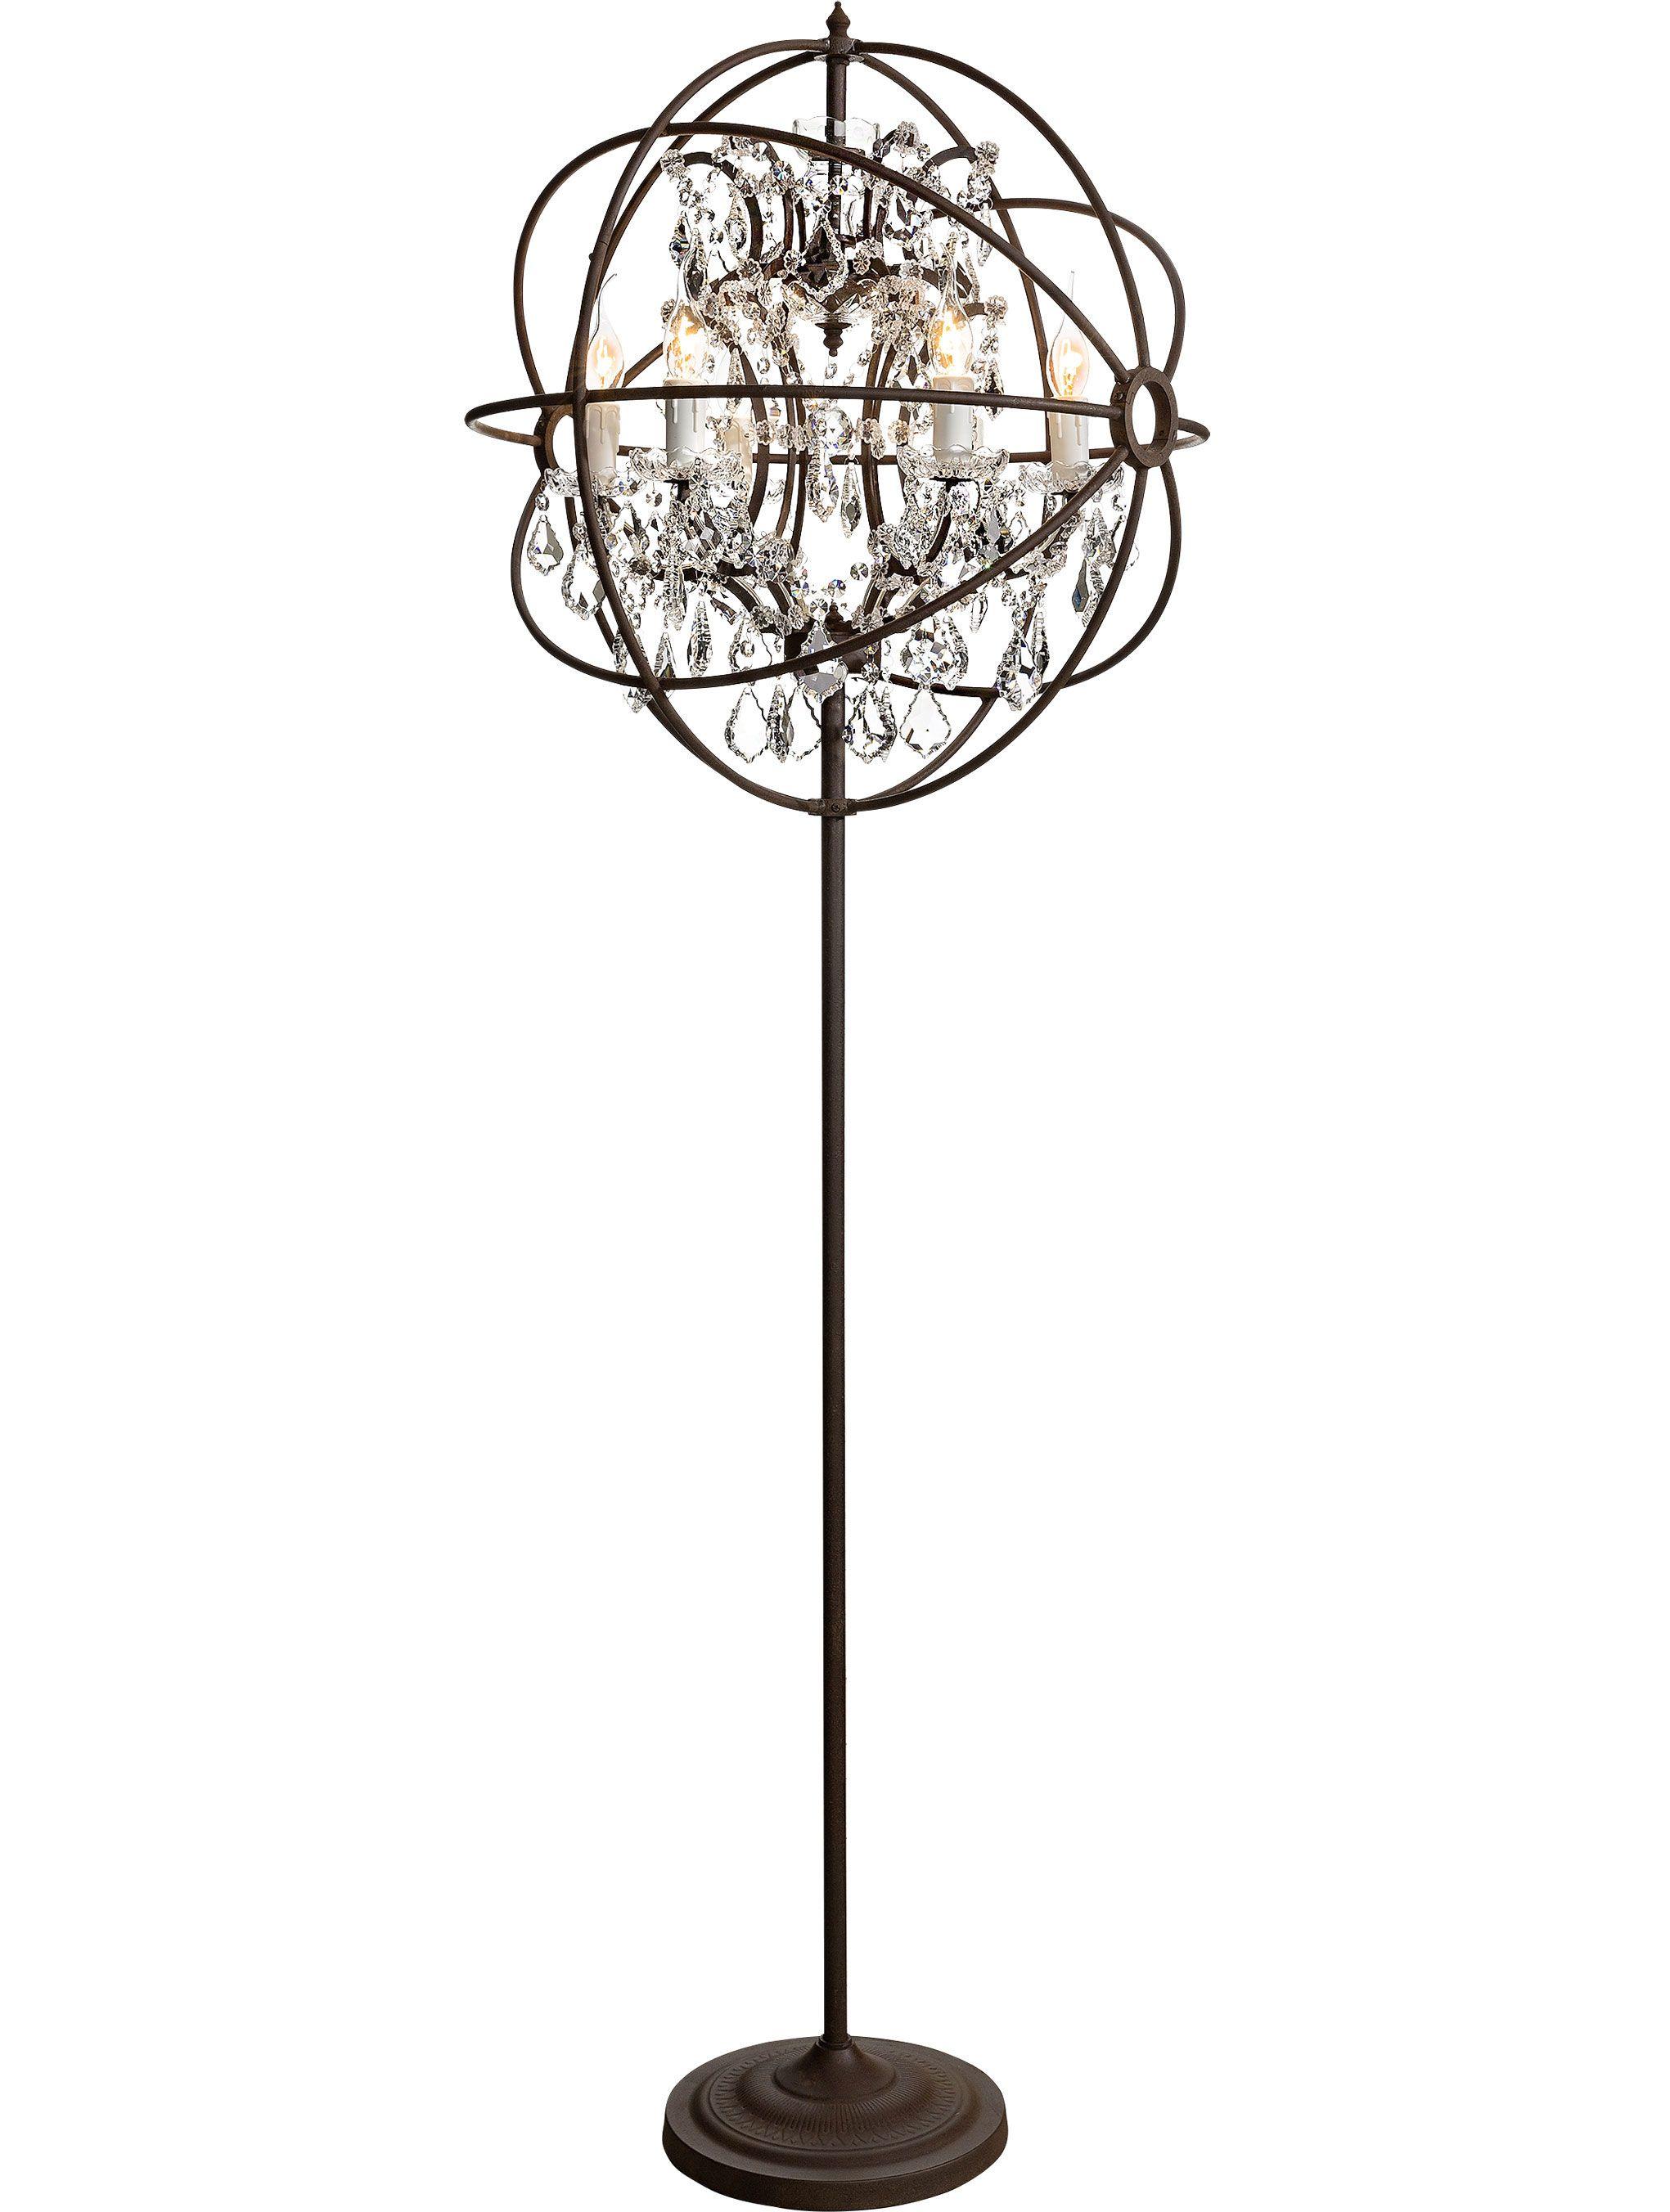 Artistic chandelier floor lamp ideas 4 decorsip light fixtures selecting the best chandelier floor lamp for the house cheap chandelier floor lamp arubaitofo Choice Image